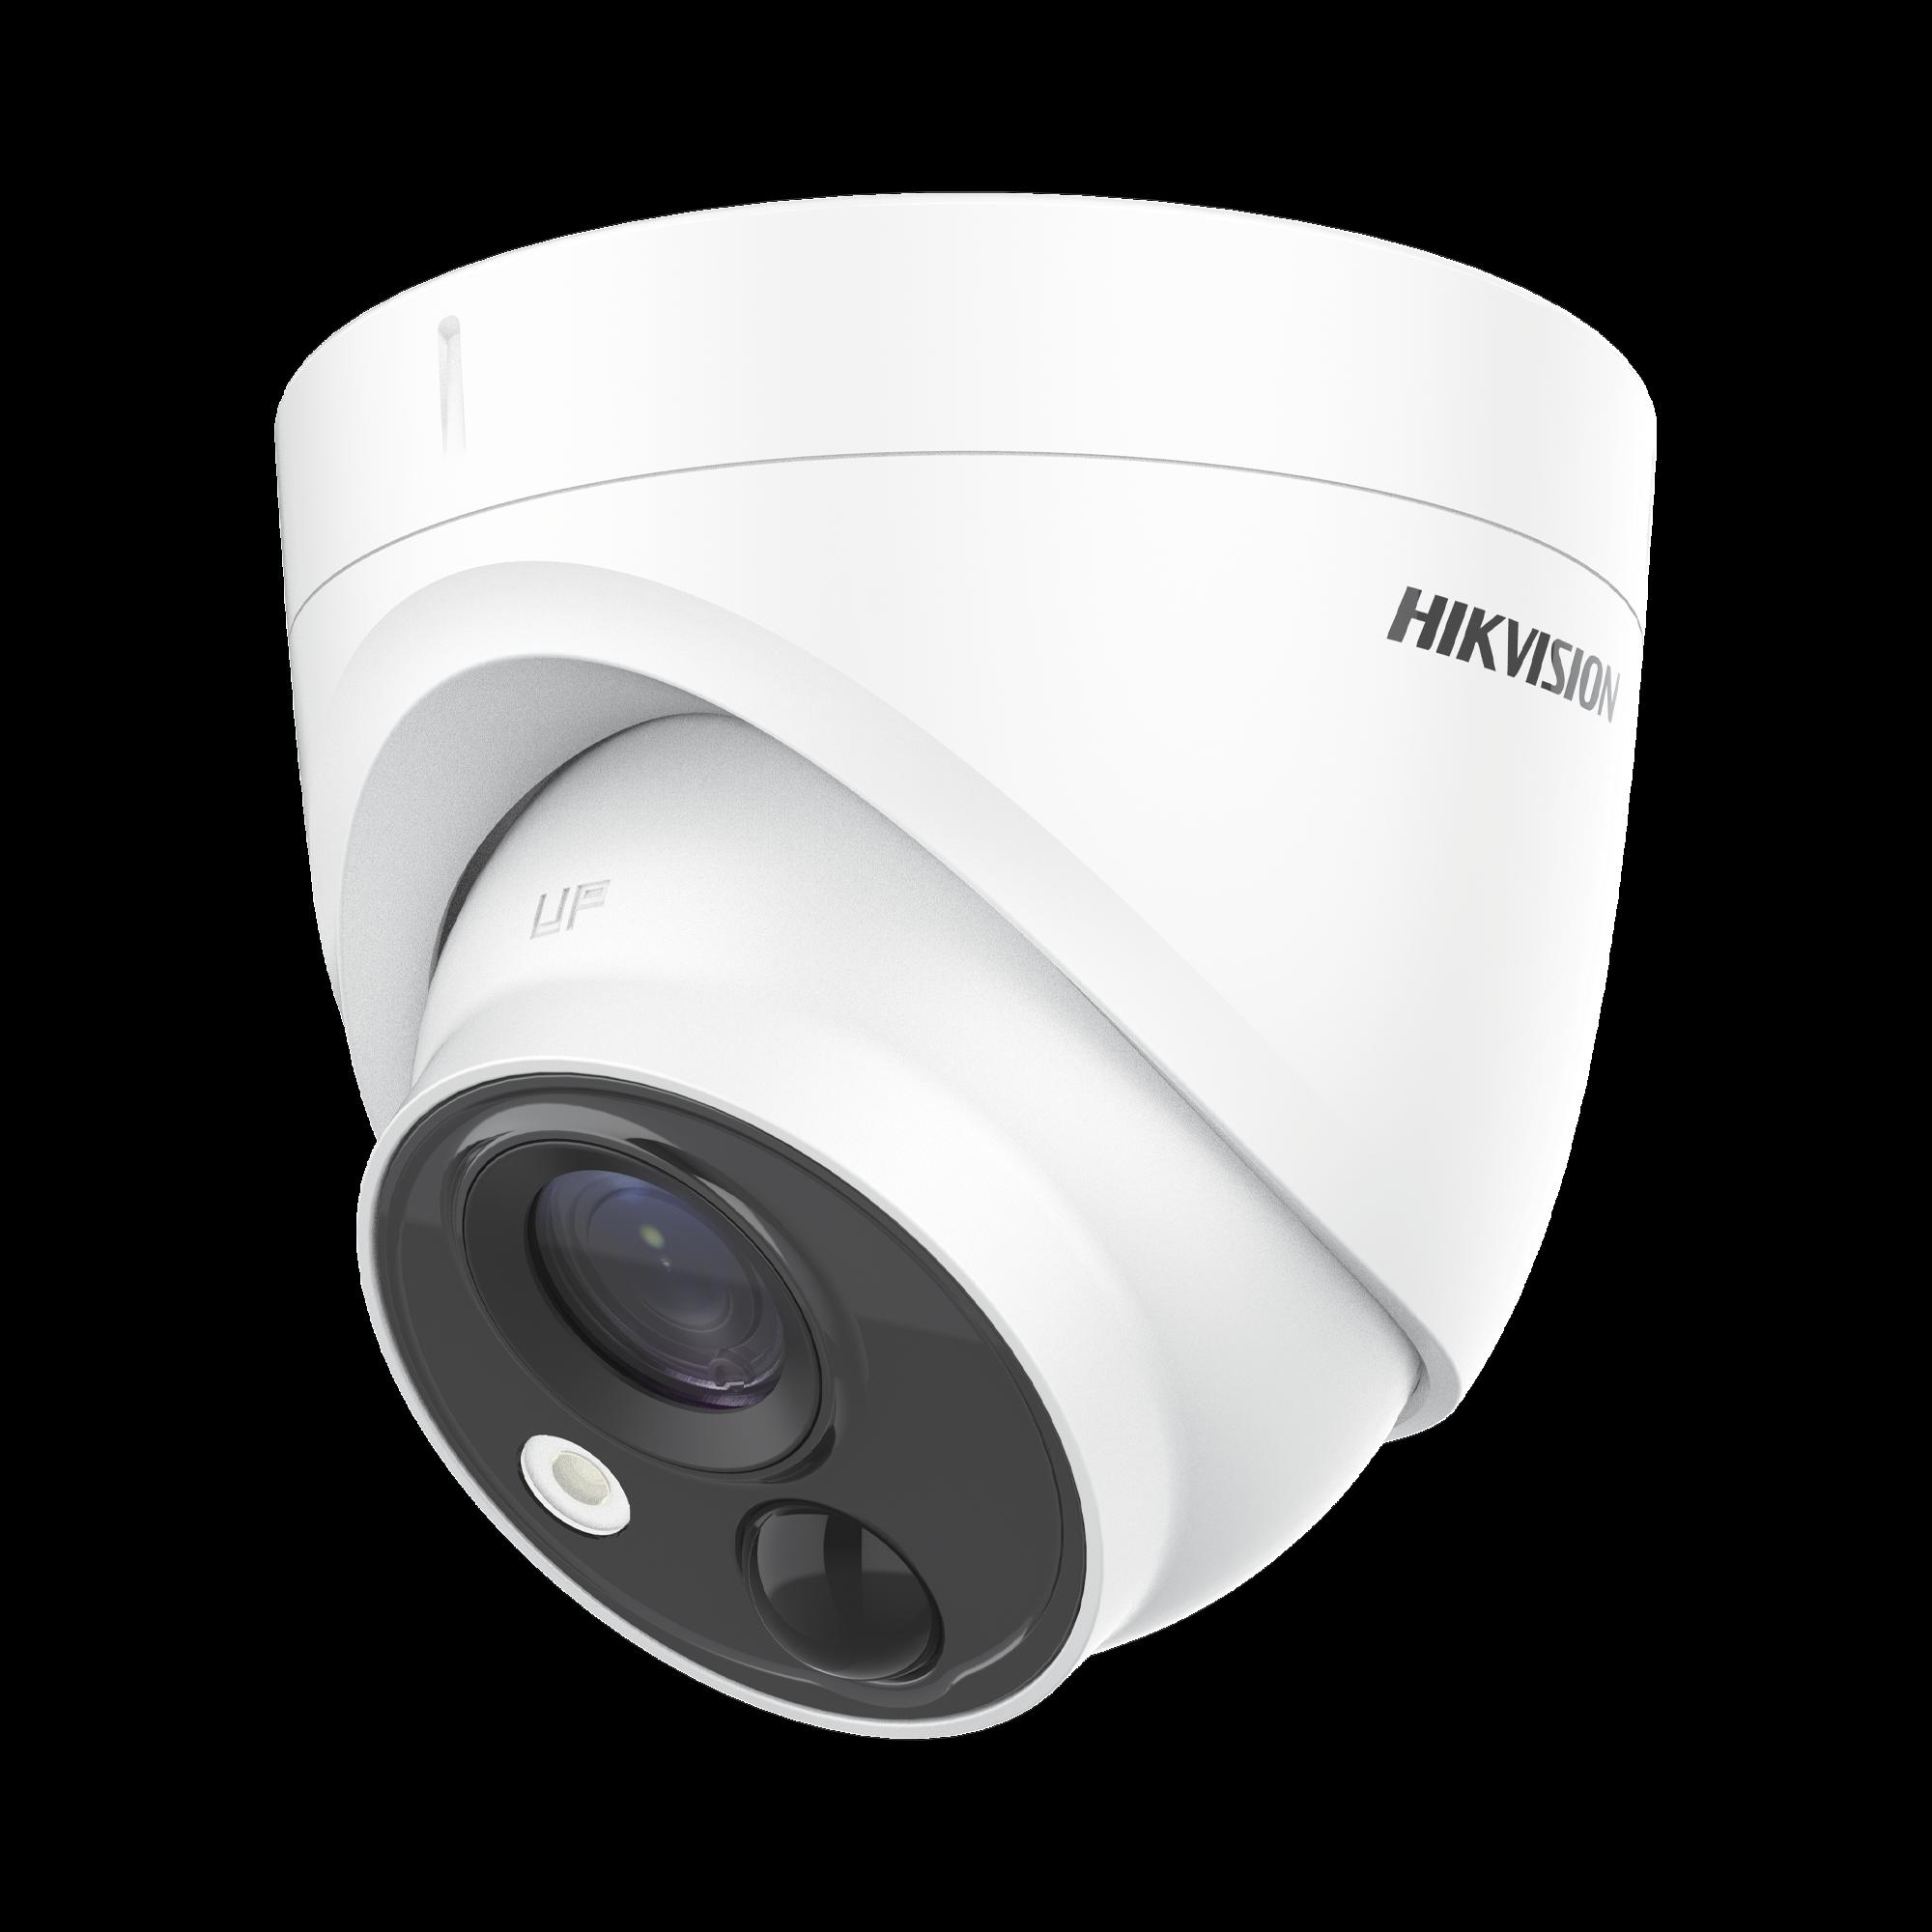 Turret FLASH TURBOHD (LED Blancos Intermitentes) / PIR (EVITA Falsas Alarmas) / 2 Megapixel (1080p) / 20 mts IR EXIR / Lente 2.8 mm / IP67 / Salida de Alarma